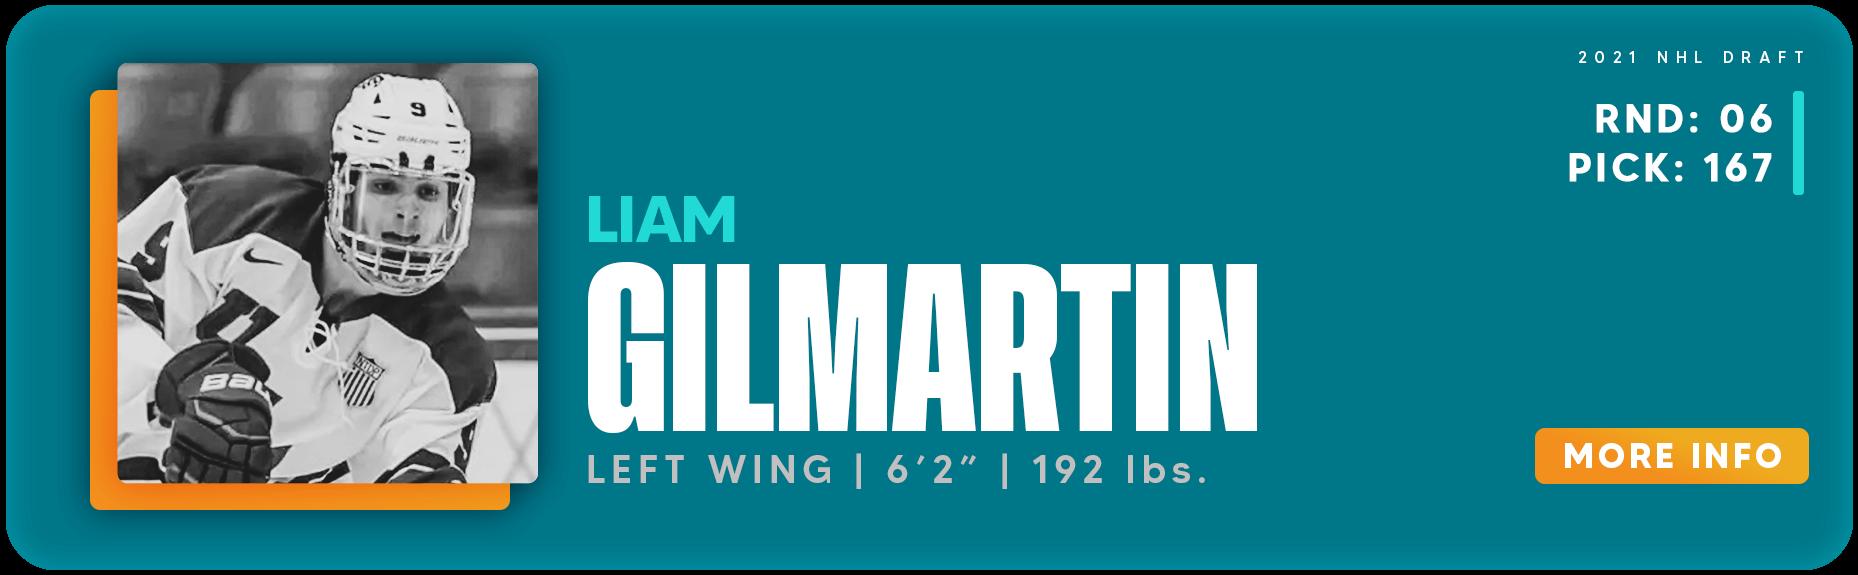 Liam Gilmartin